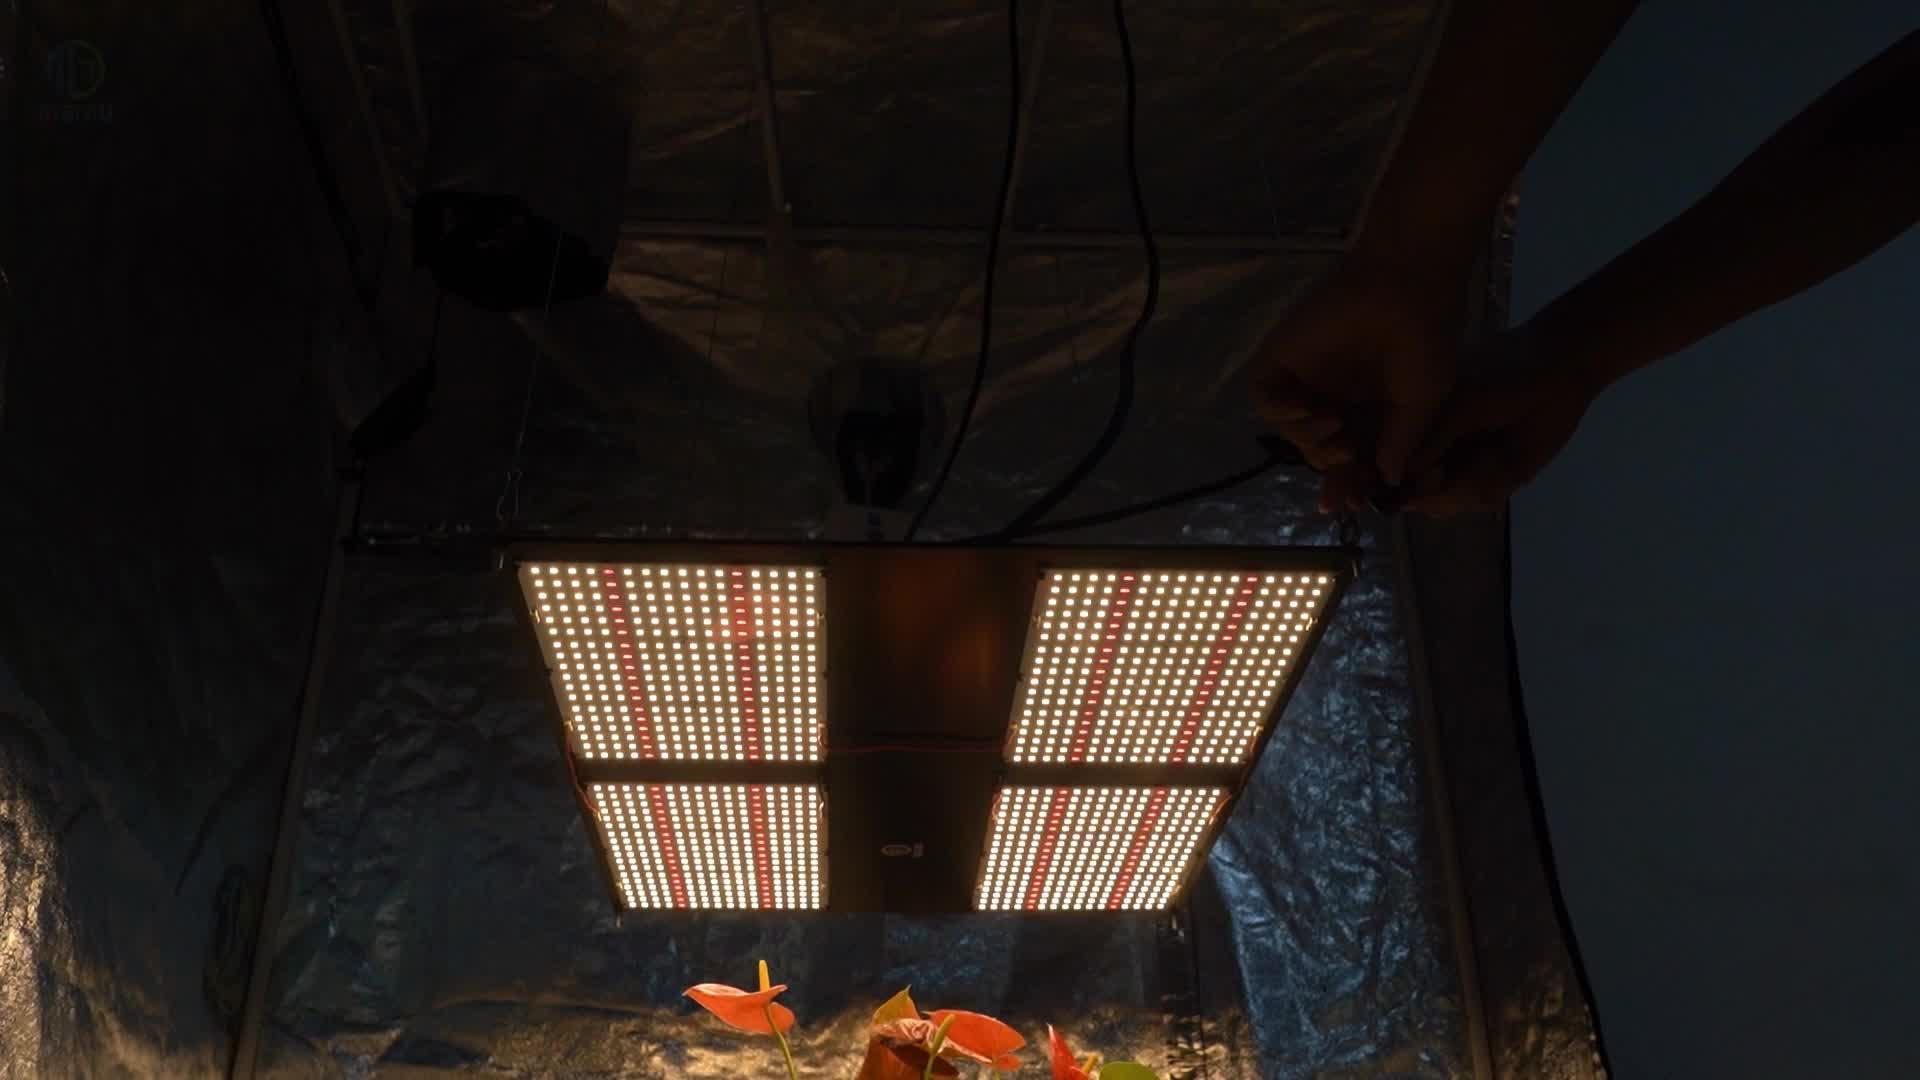 Meijiu 2020 QB288 480W Led Pcb Boards Grow Light, Shenzhen Hot Seller FoMex qbv2 Lm301b Medical Plant Grow Light